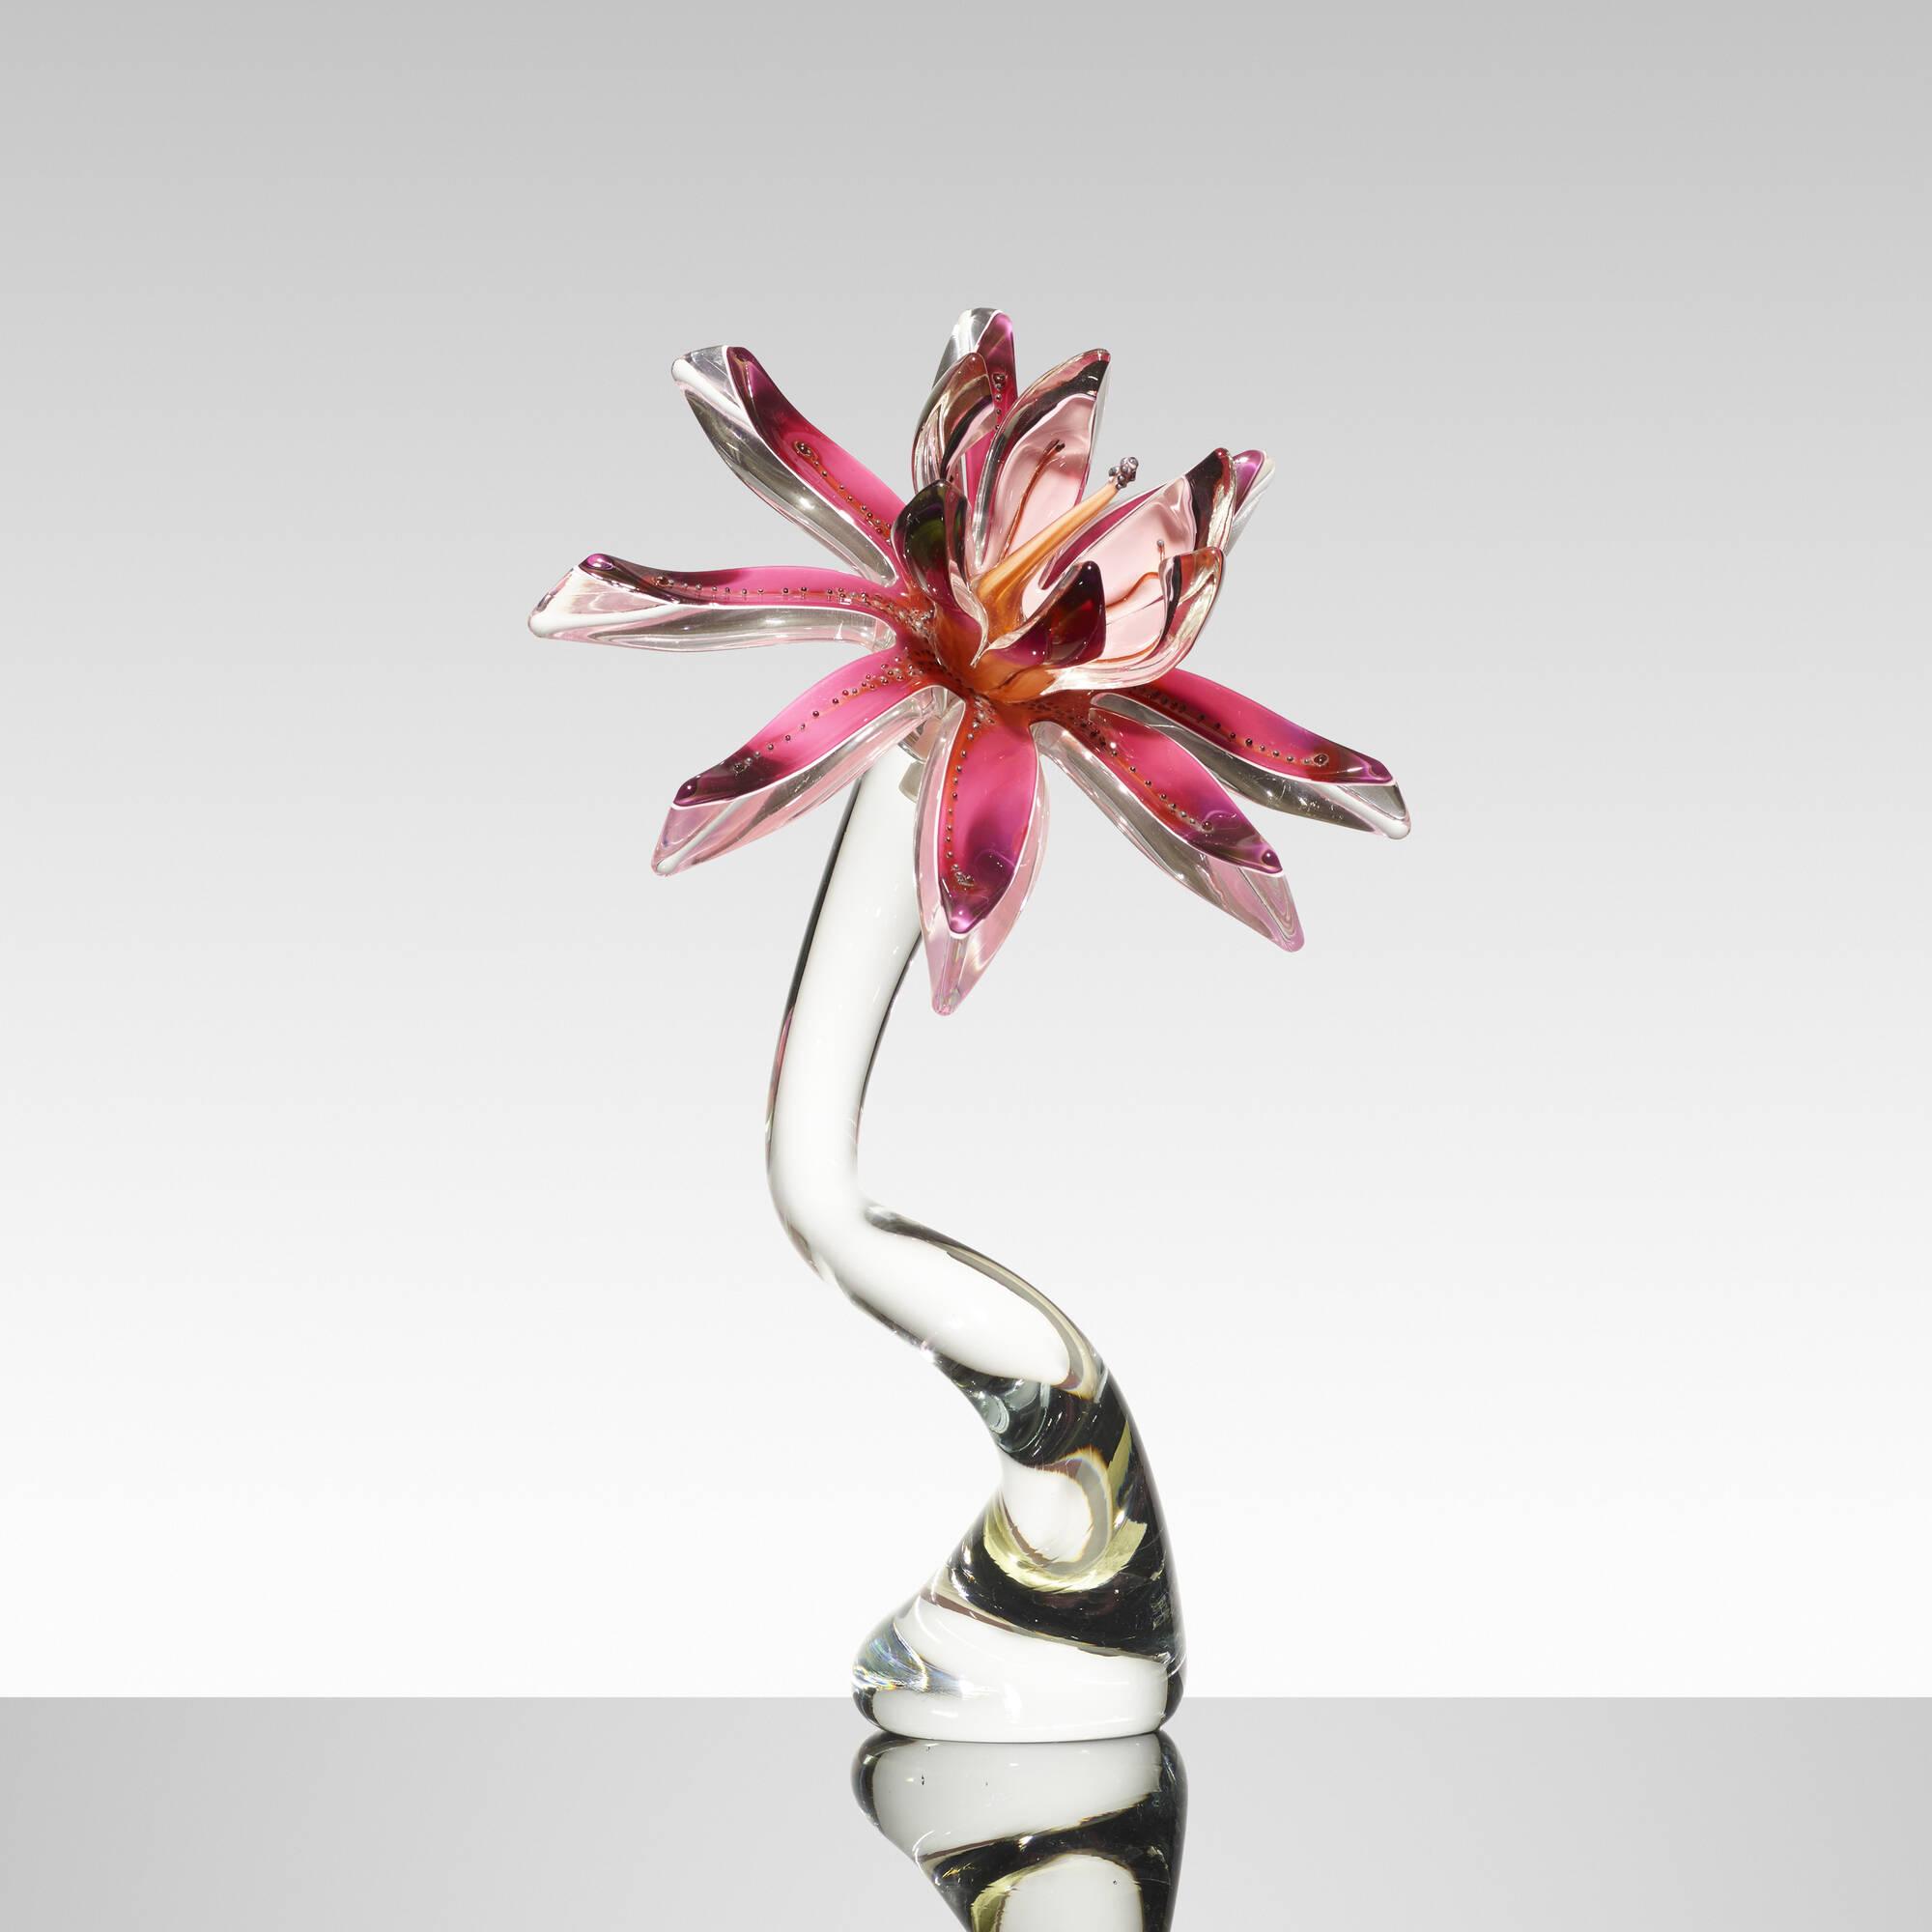 116: John Littleton and Kate Vogel / Aqua Flora 3-46 (1 of 3)